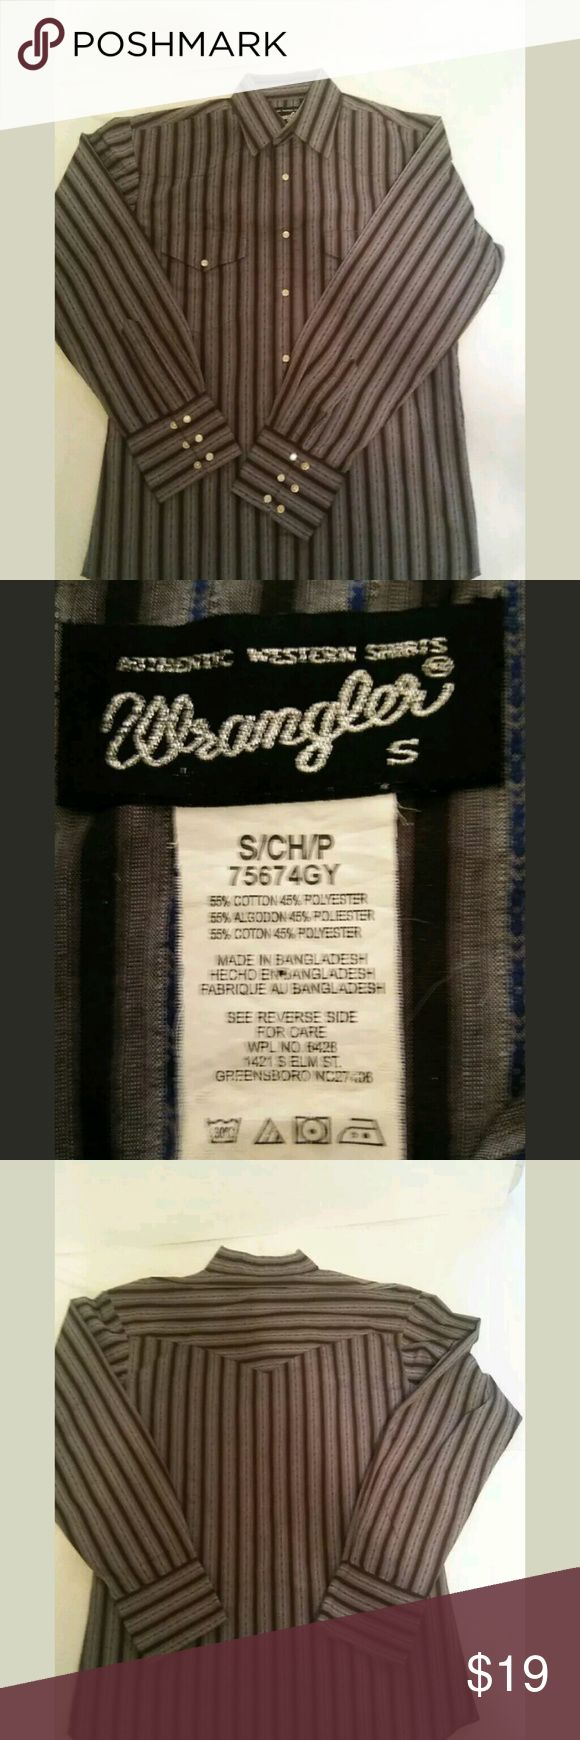 Mens wrangler shirt Snap down , front pockets, like new condition. wrangler Shirts Dress Shirts